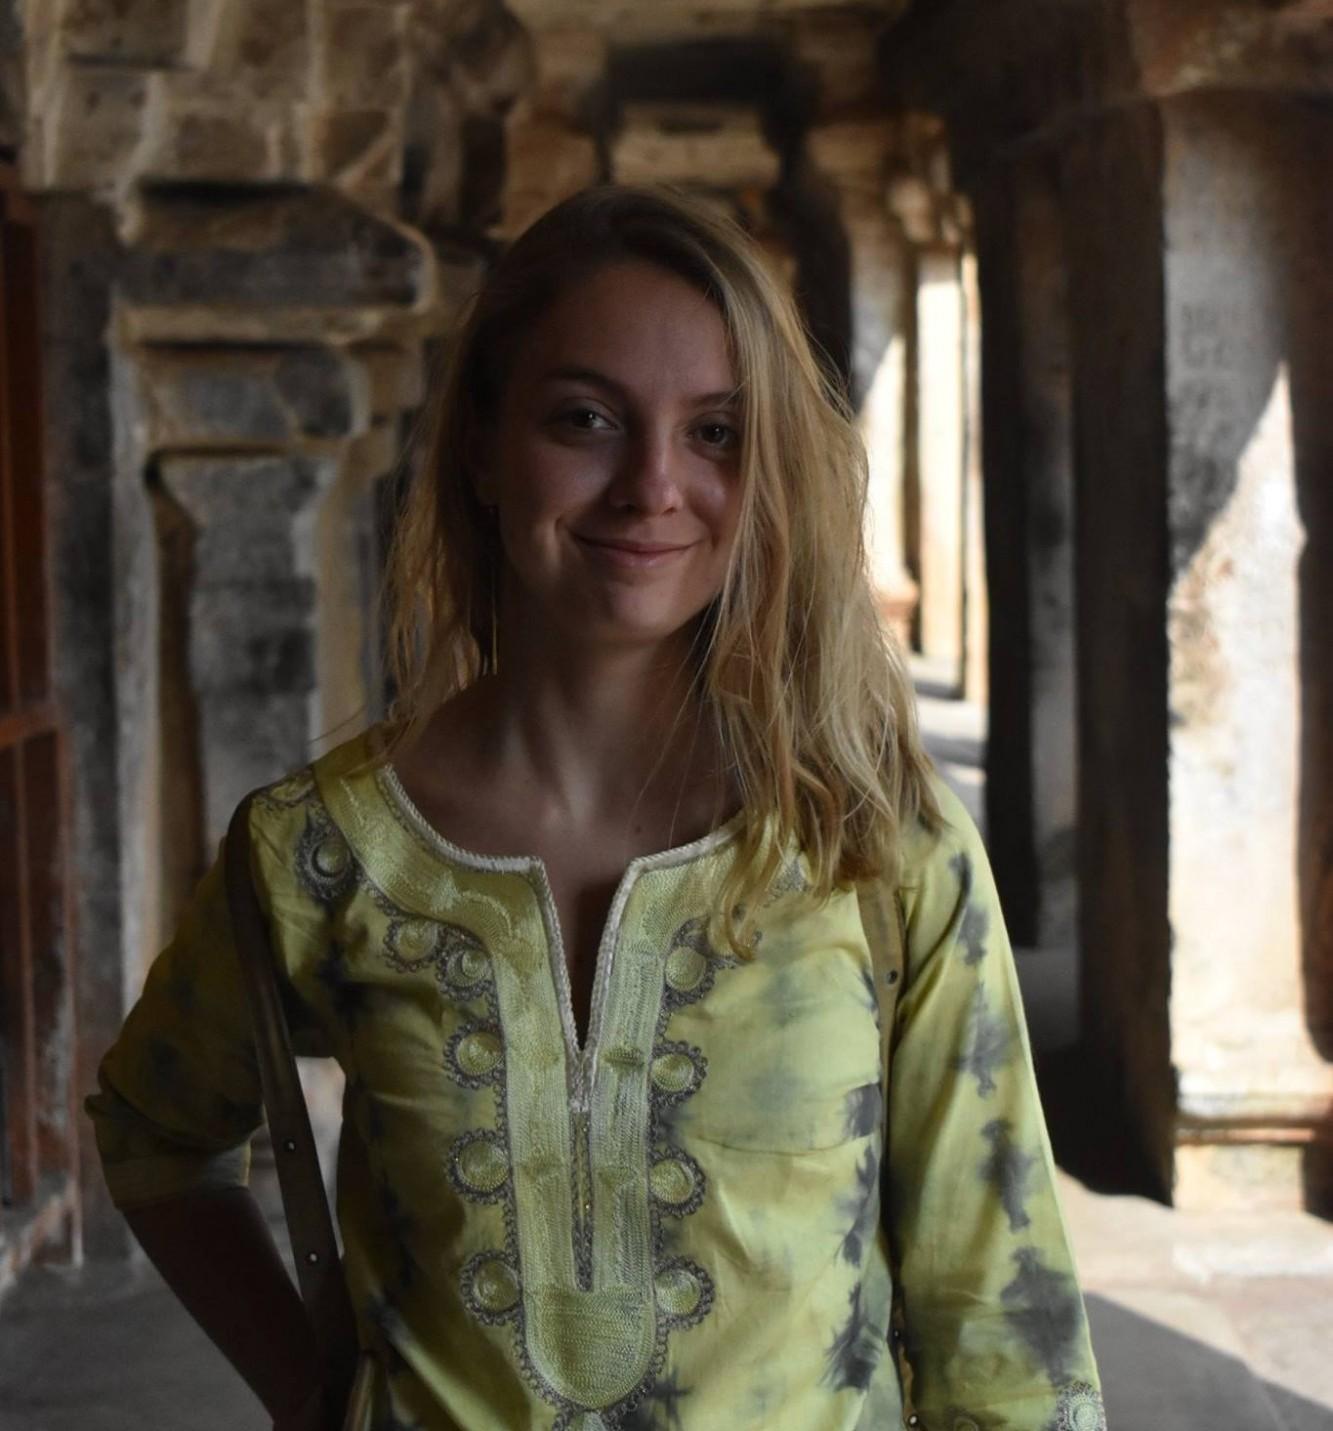 photo of Tara Giangrande